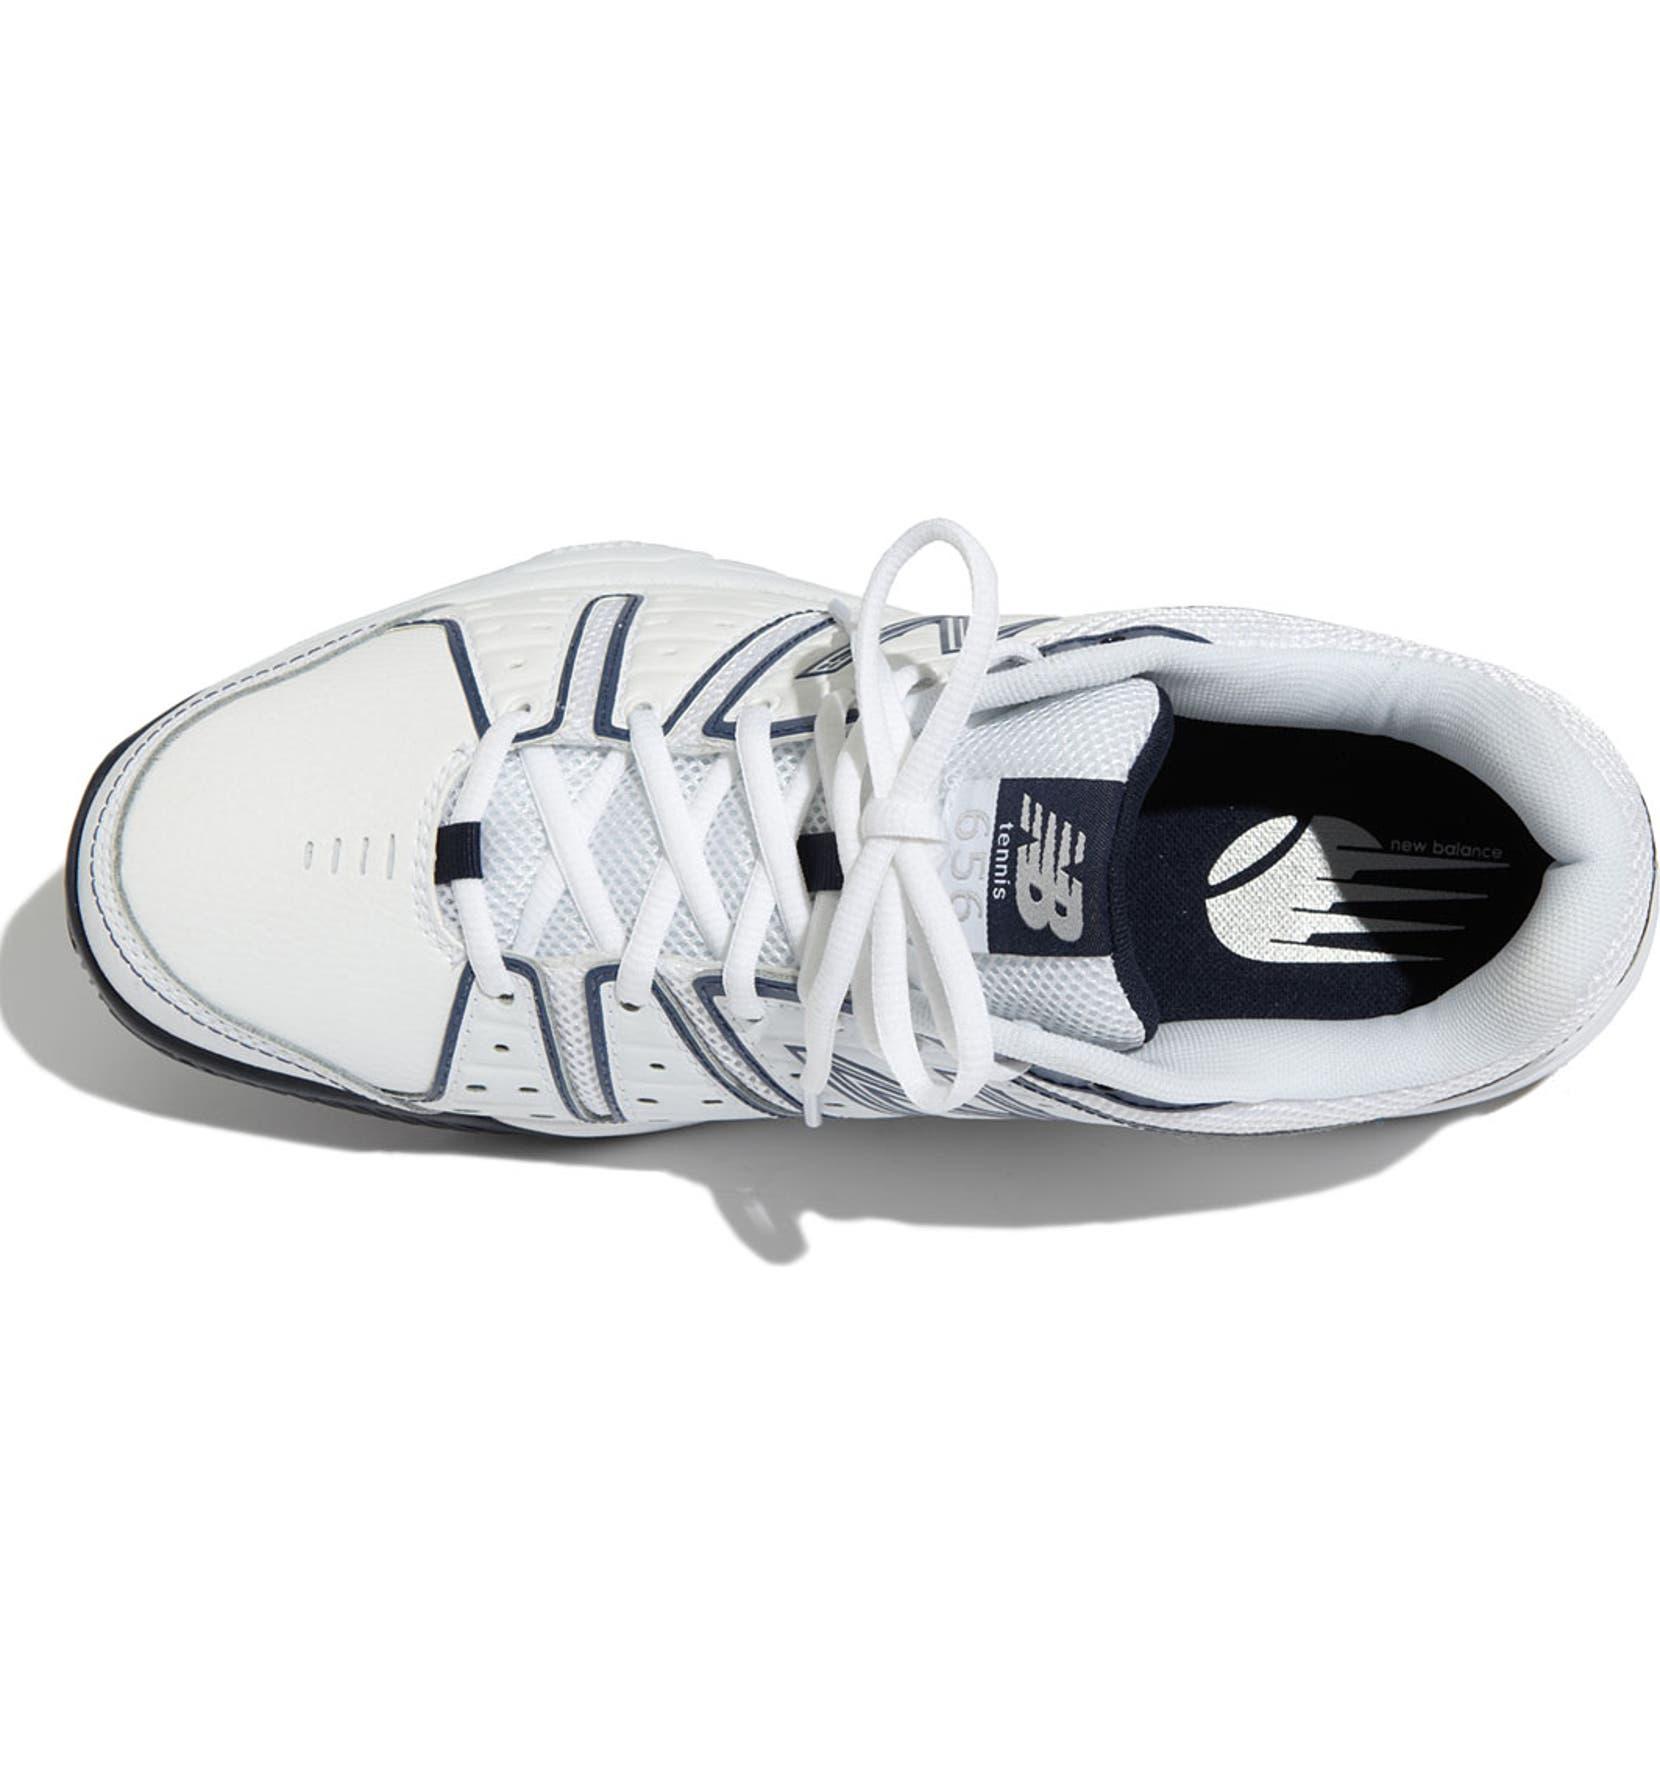 a3848c85 '656' Tennis Shoe